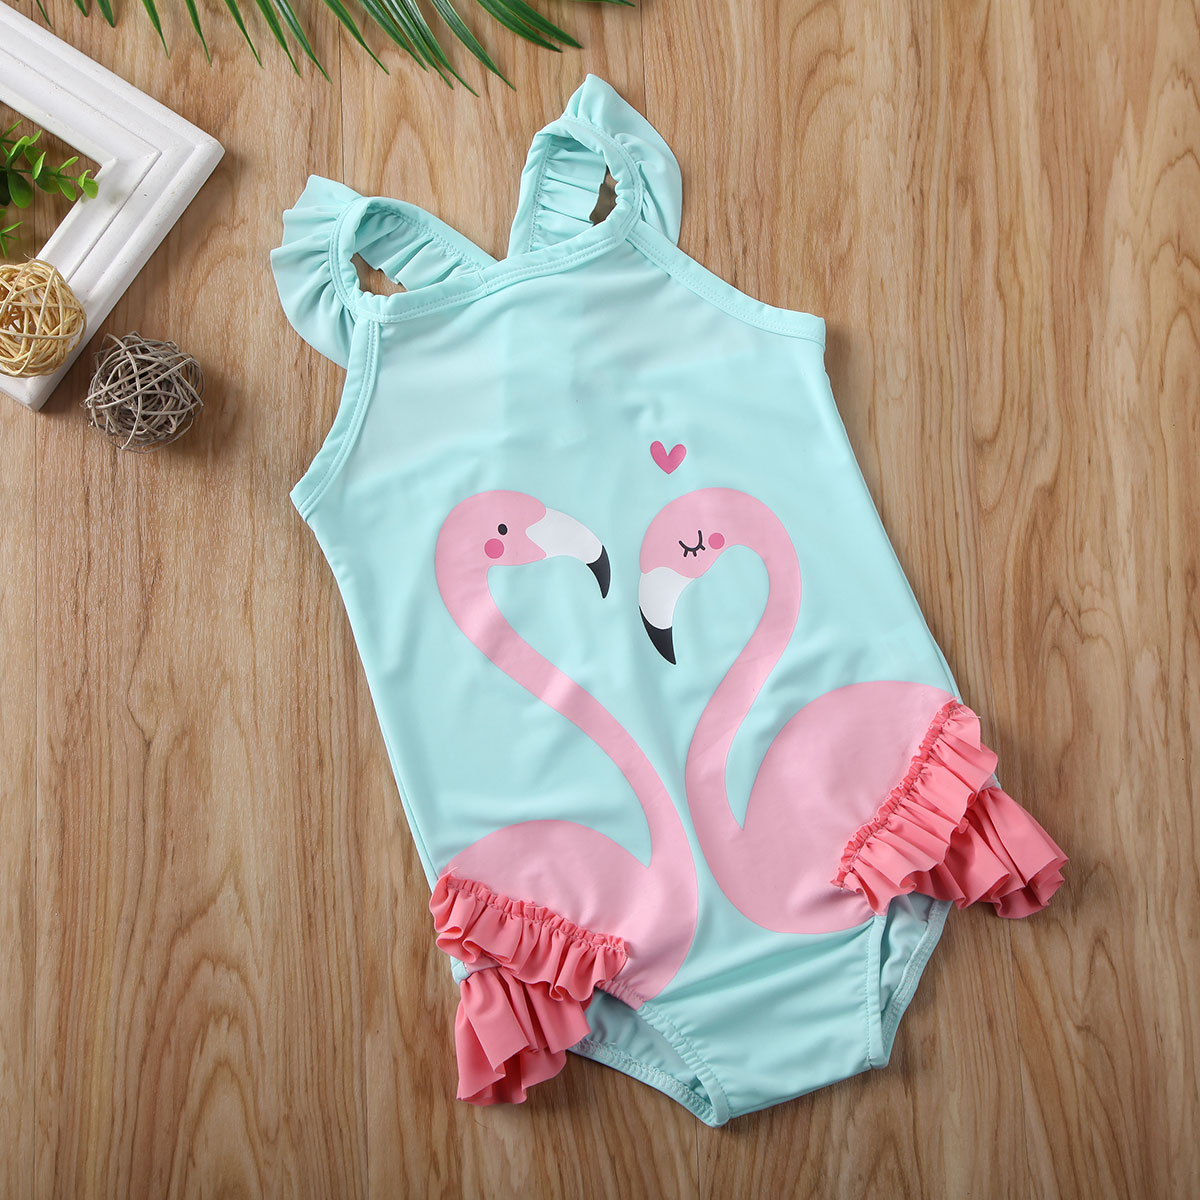 Pudcoco Toddler Baby Girl Clothes Flamingo Print Swimming Costume Bikini Swimwear Swimsuit Beachwear Clothes